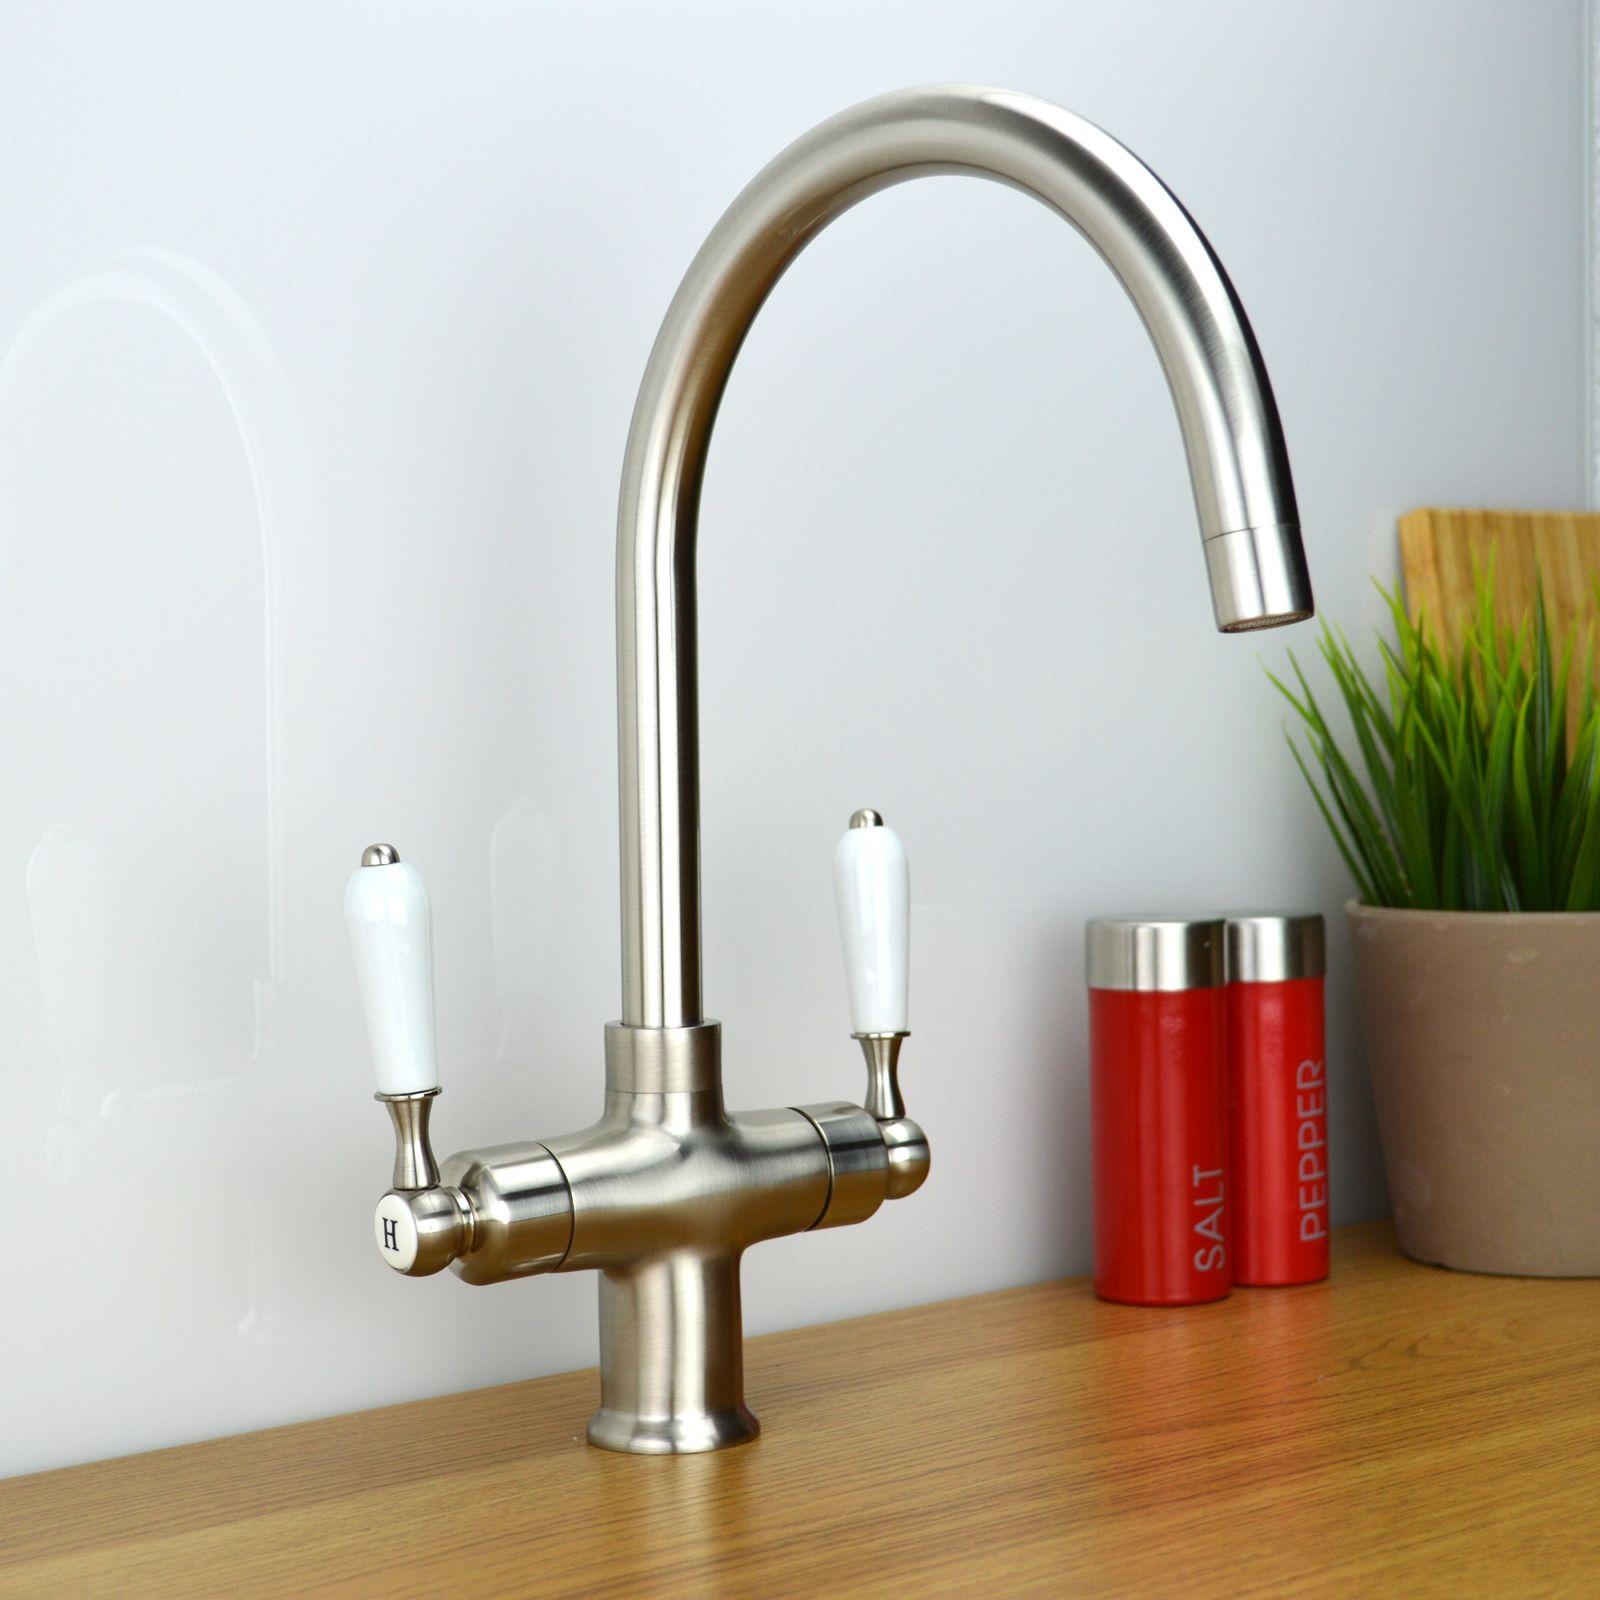 Enki Traditional Victorian Kitchen Sink Mixer Moloc Tap Br Bronze Bridge